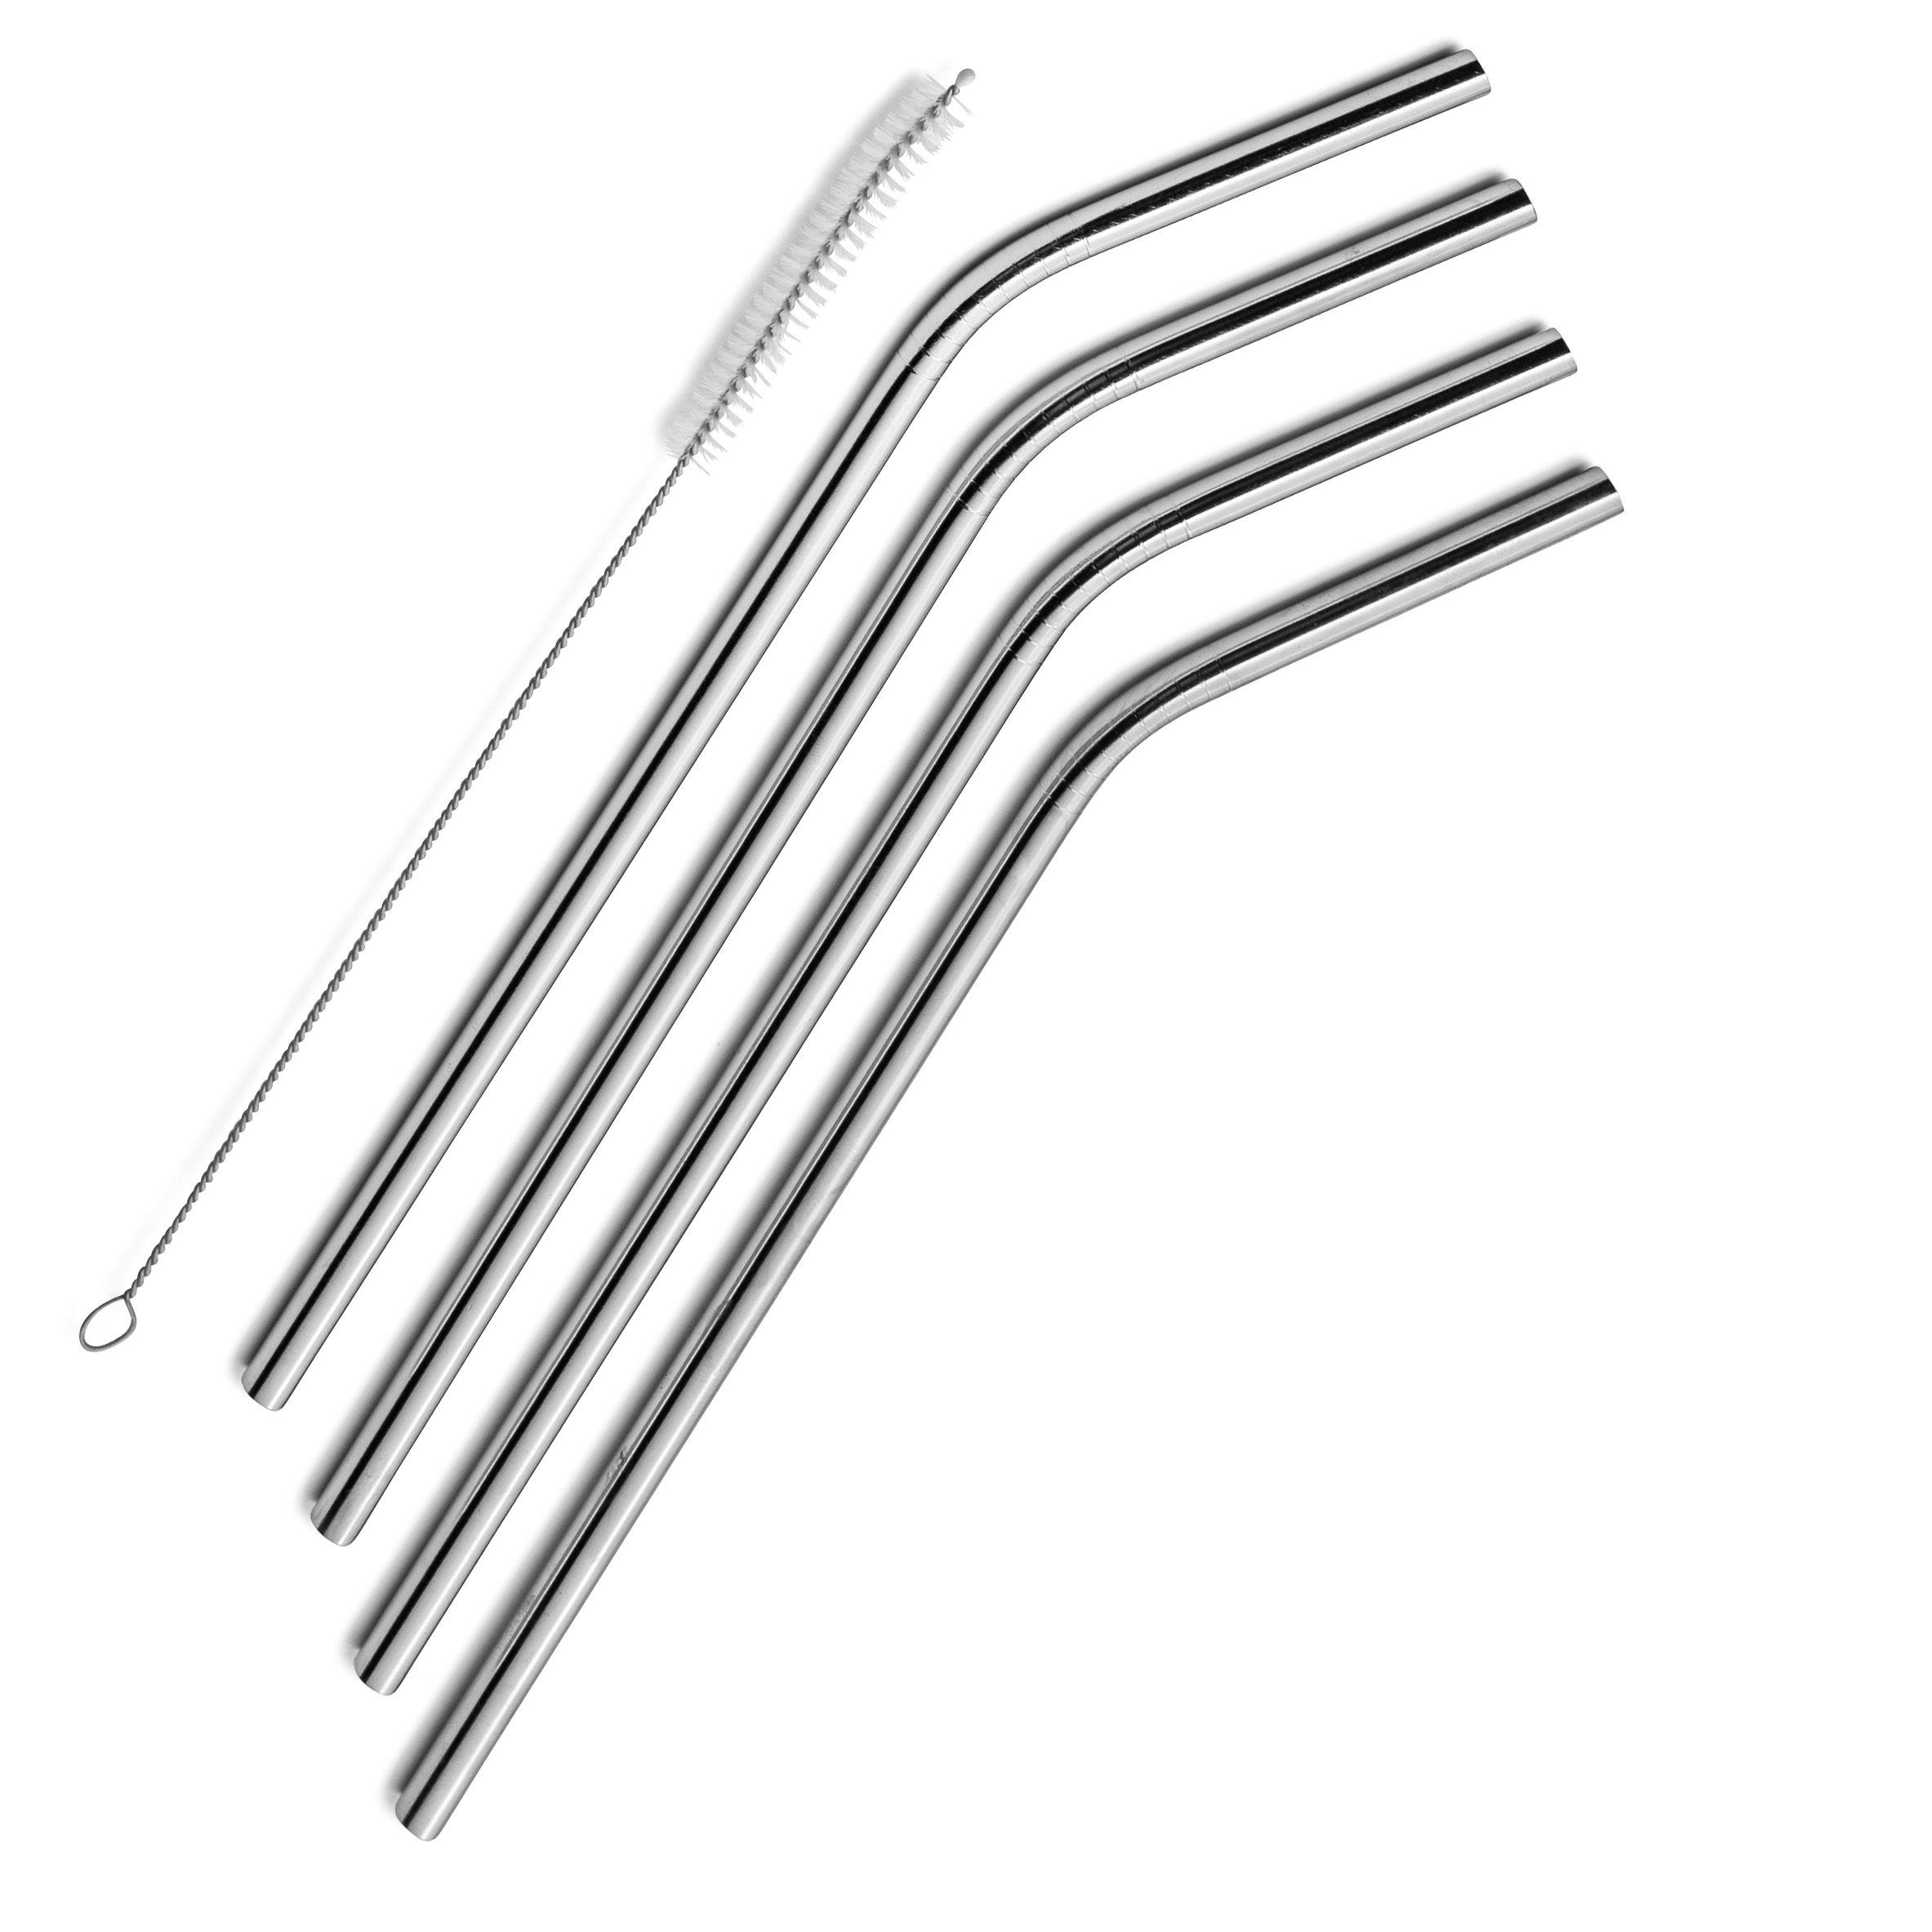 ELEPHANT-straws.jpg